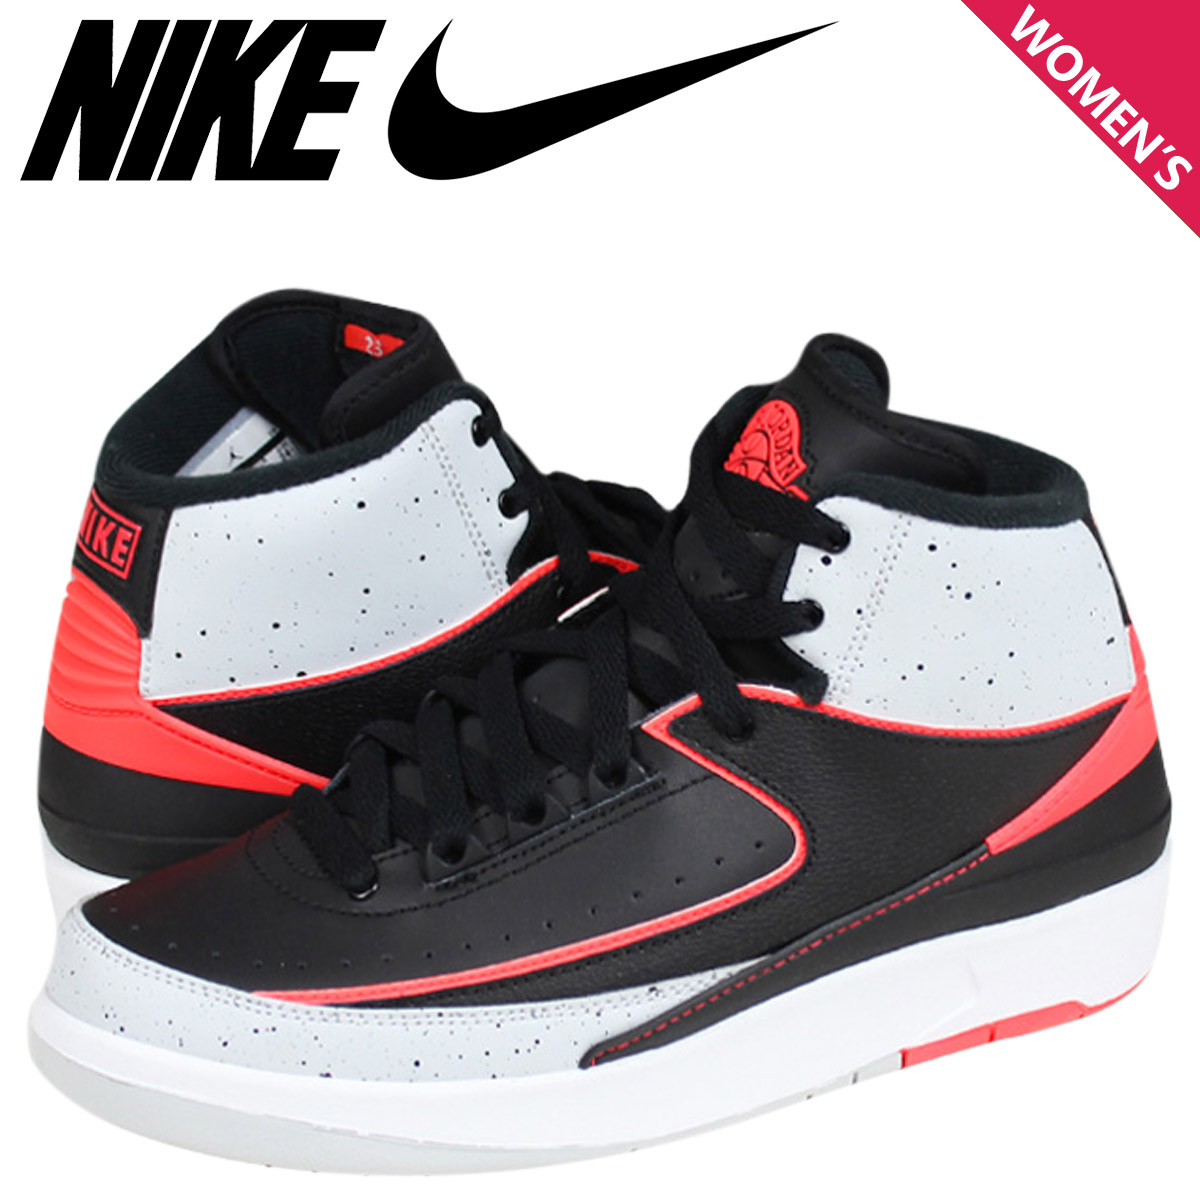 b4f26828016d Point 2 x kids Nike NIKE JORDAN 2 RETRO BG sneakers Air Jordan 2 retro  Leather